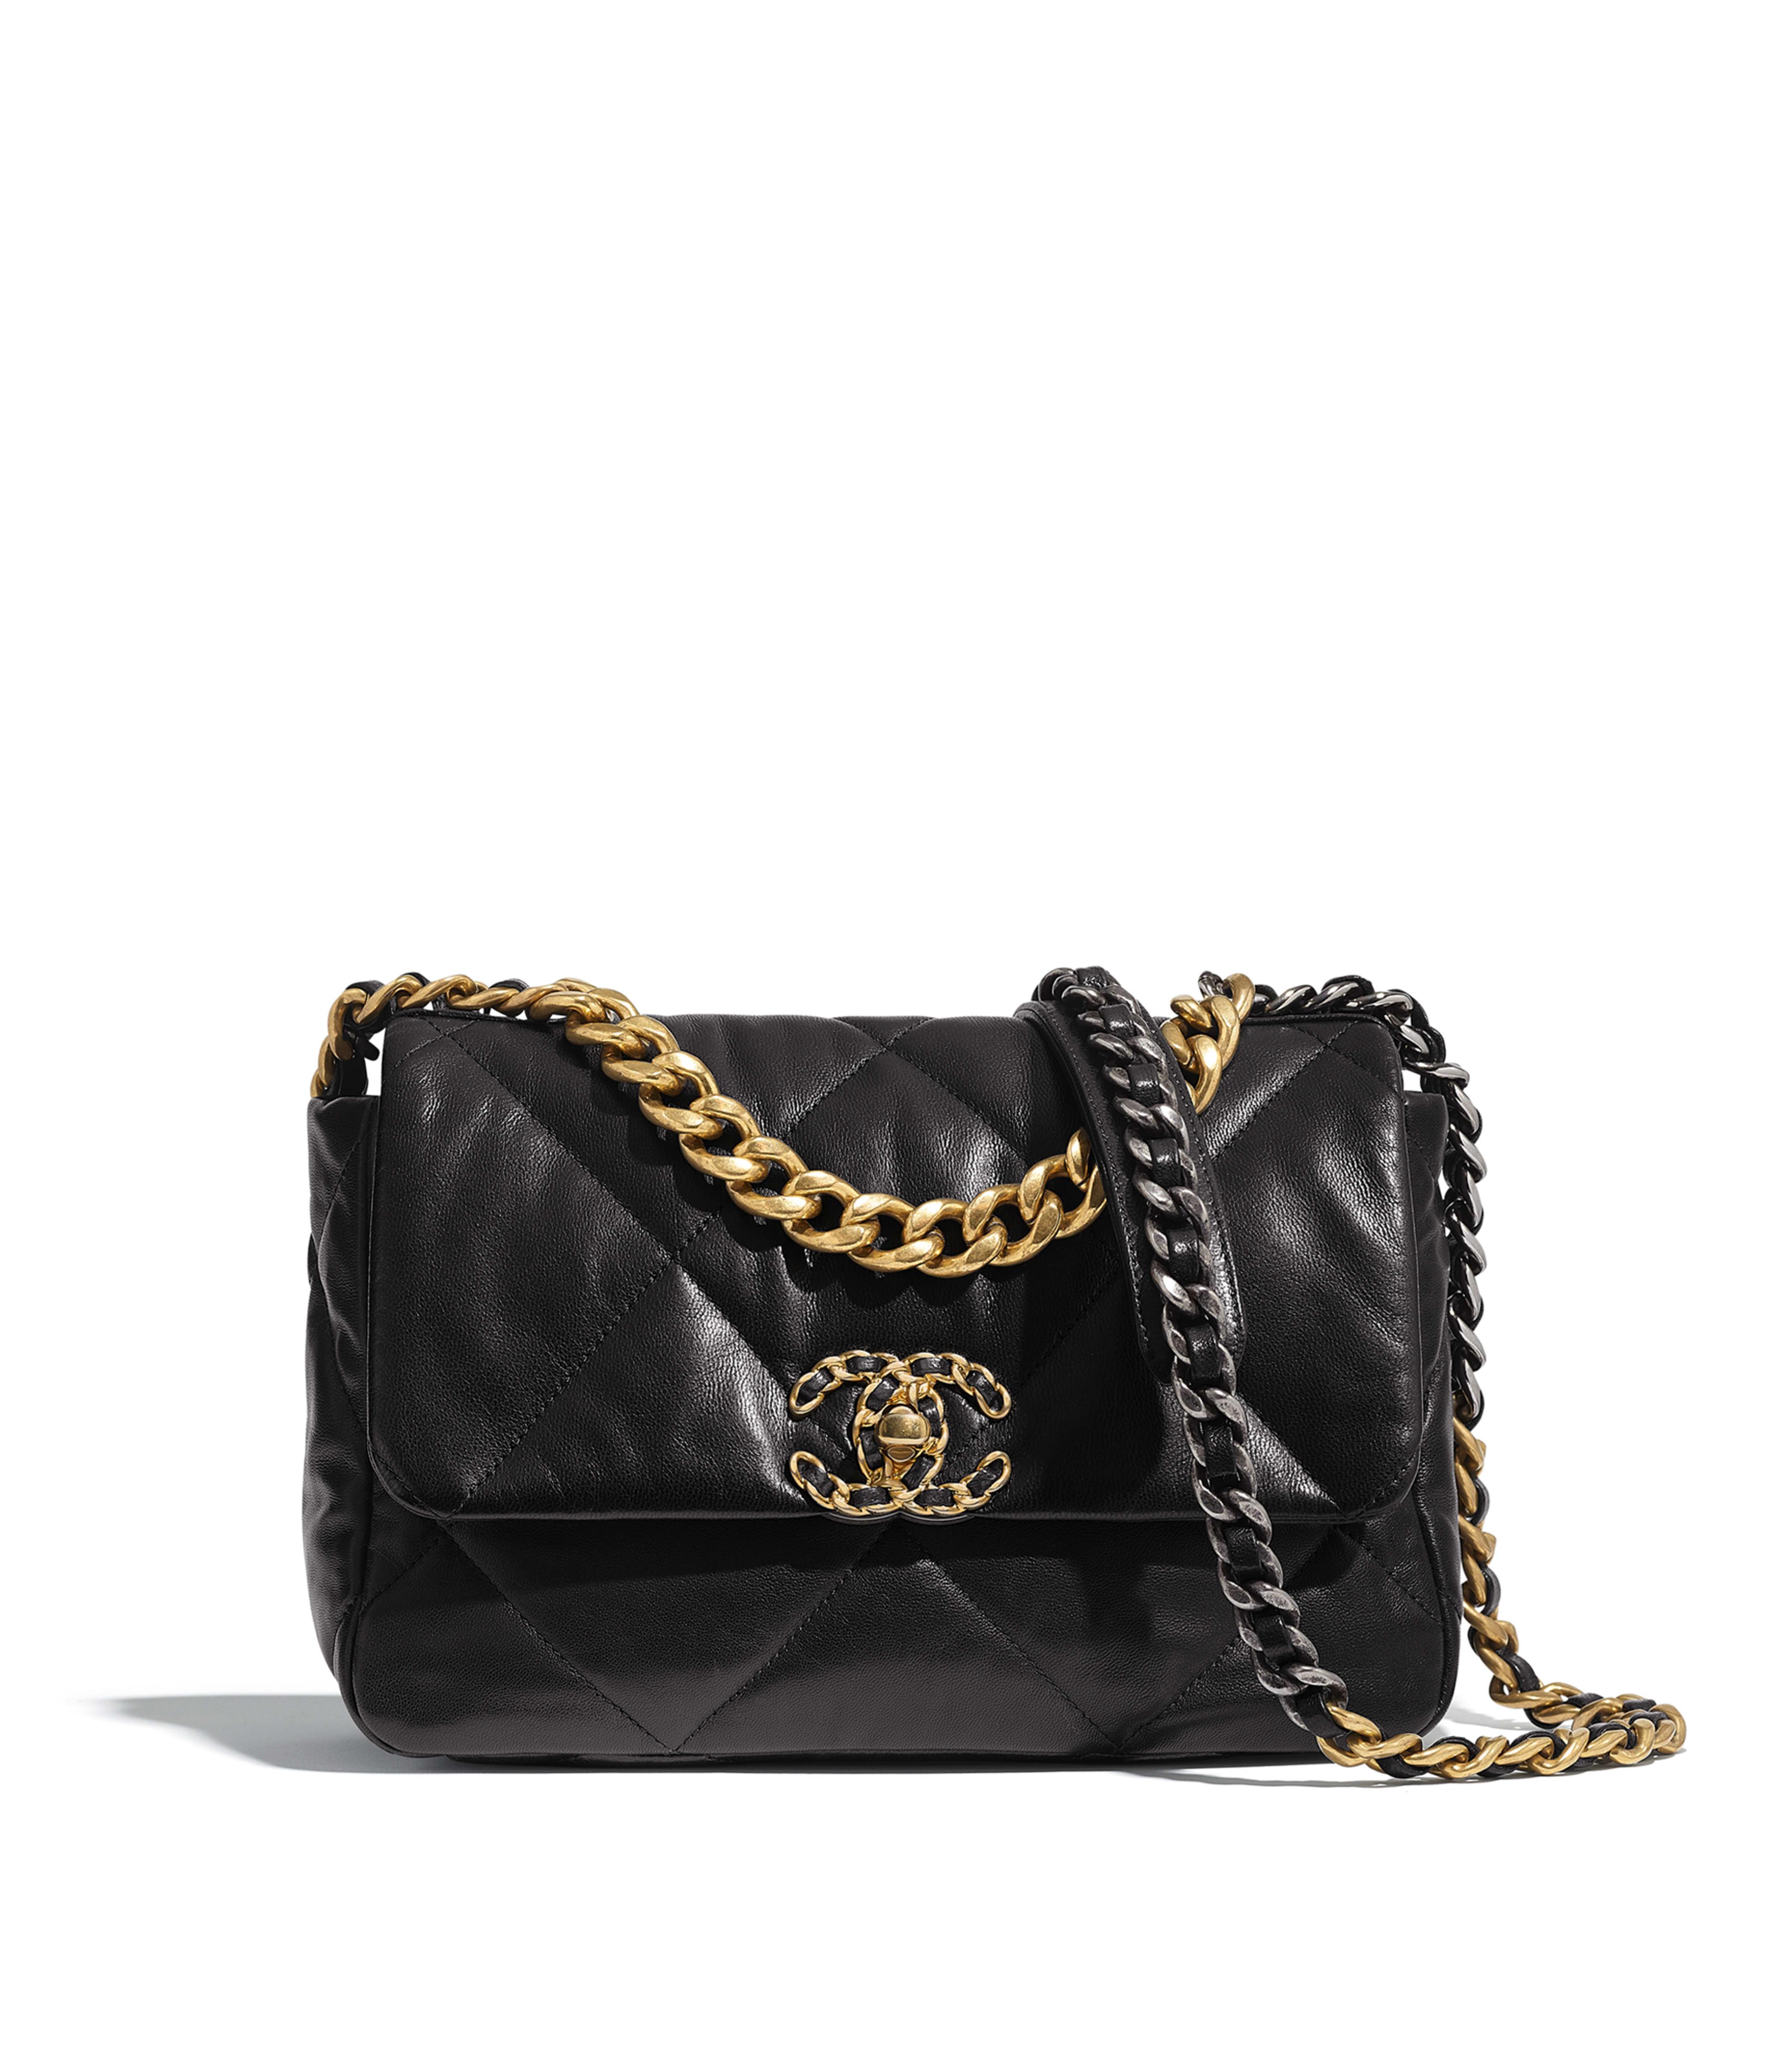 The Chanel 19 Bag Fashion